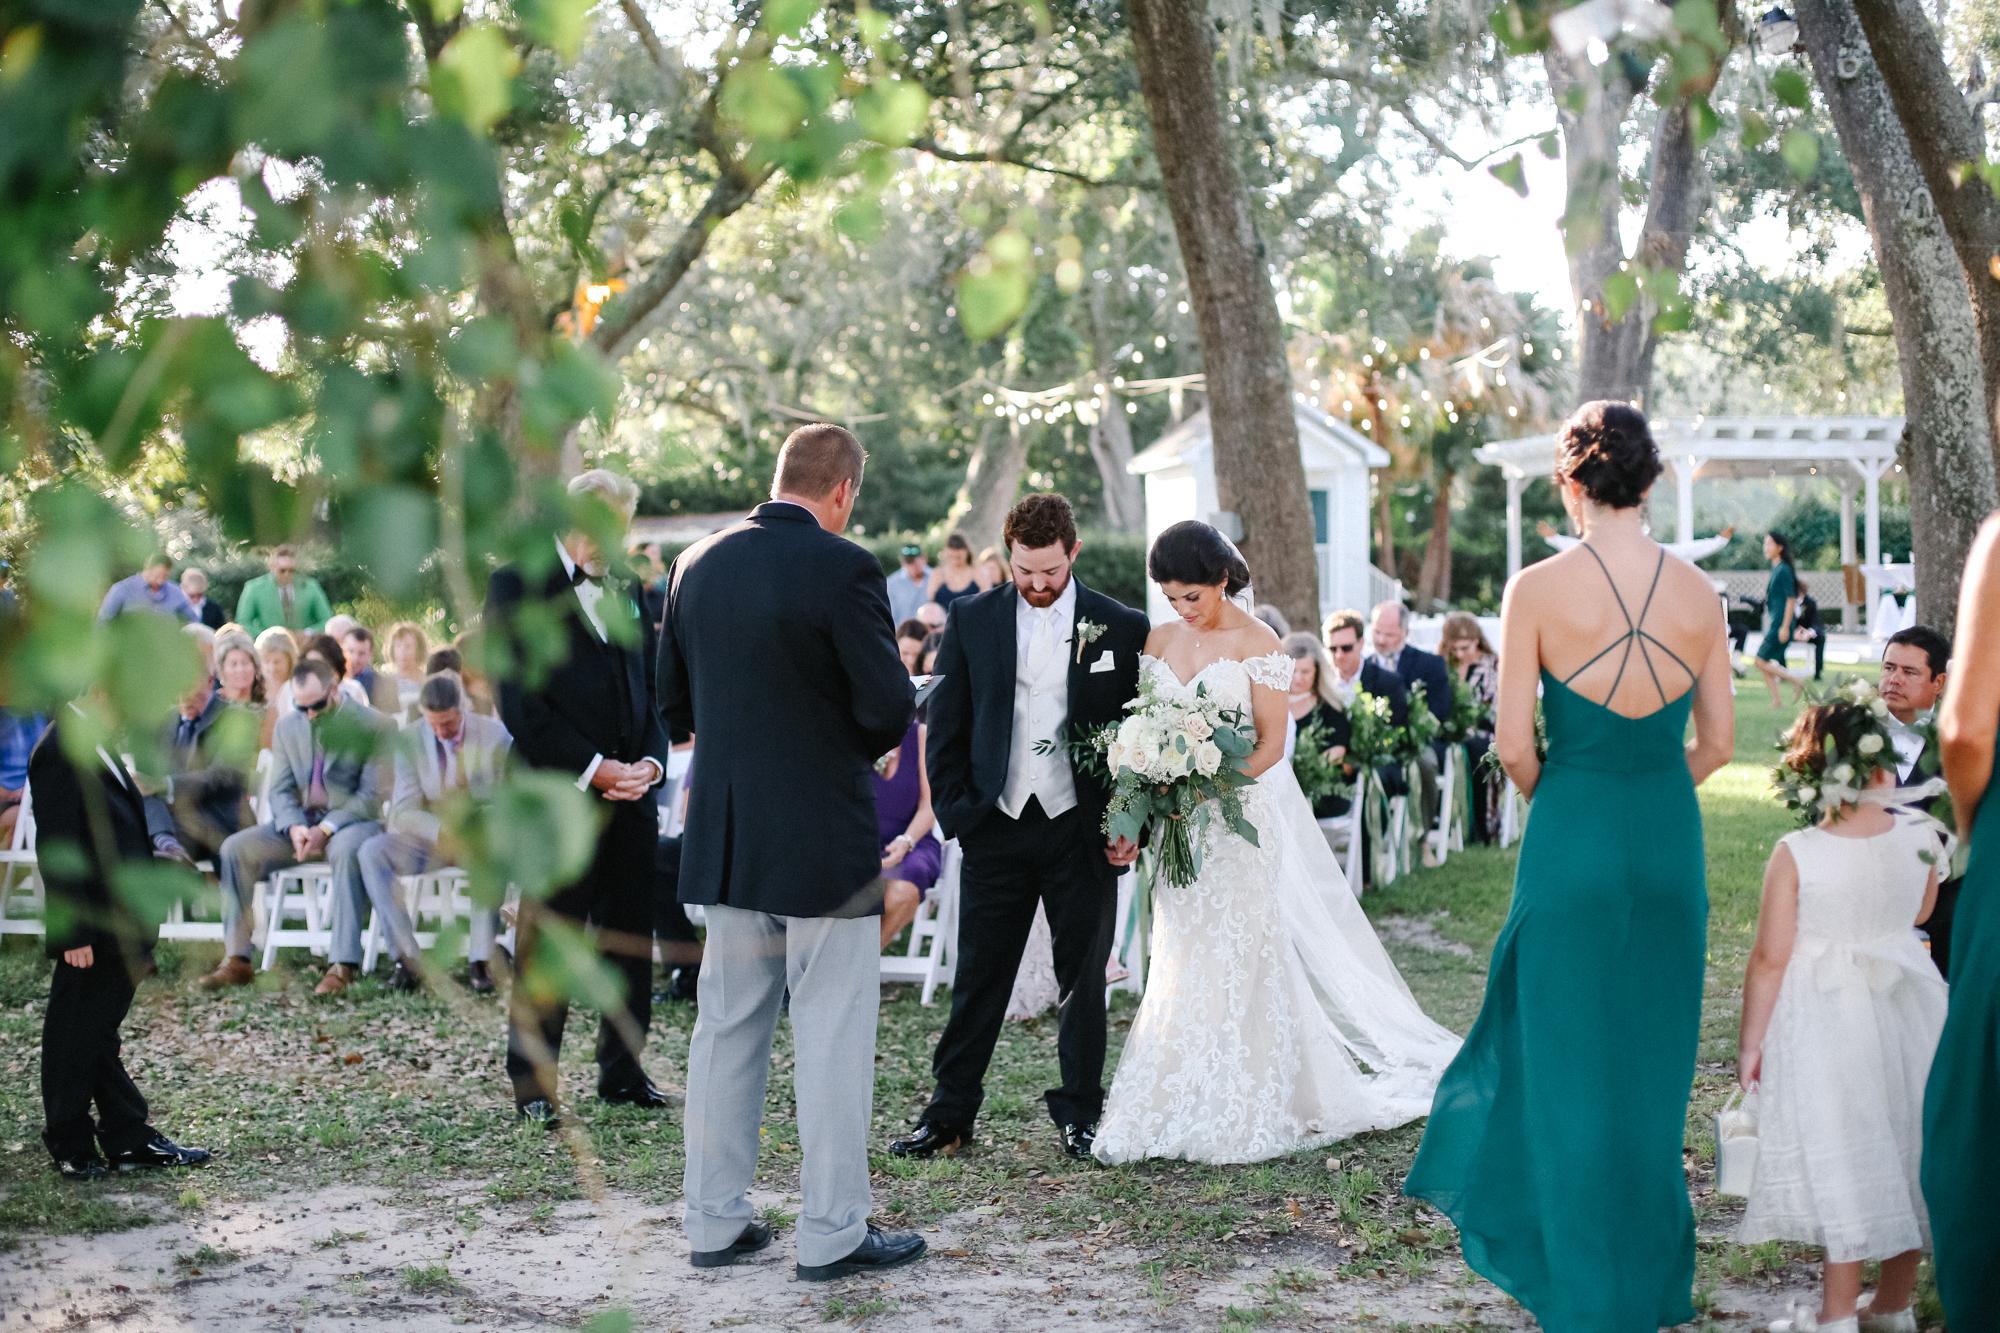 Gautier_Wedding_Photographer-104.jpg